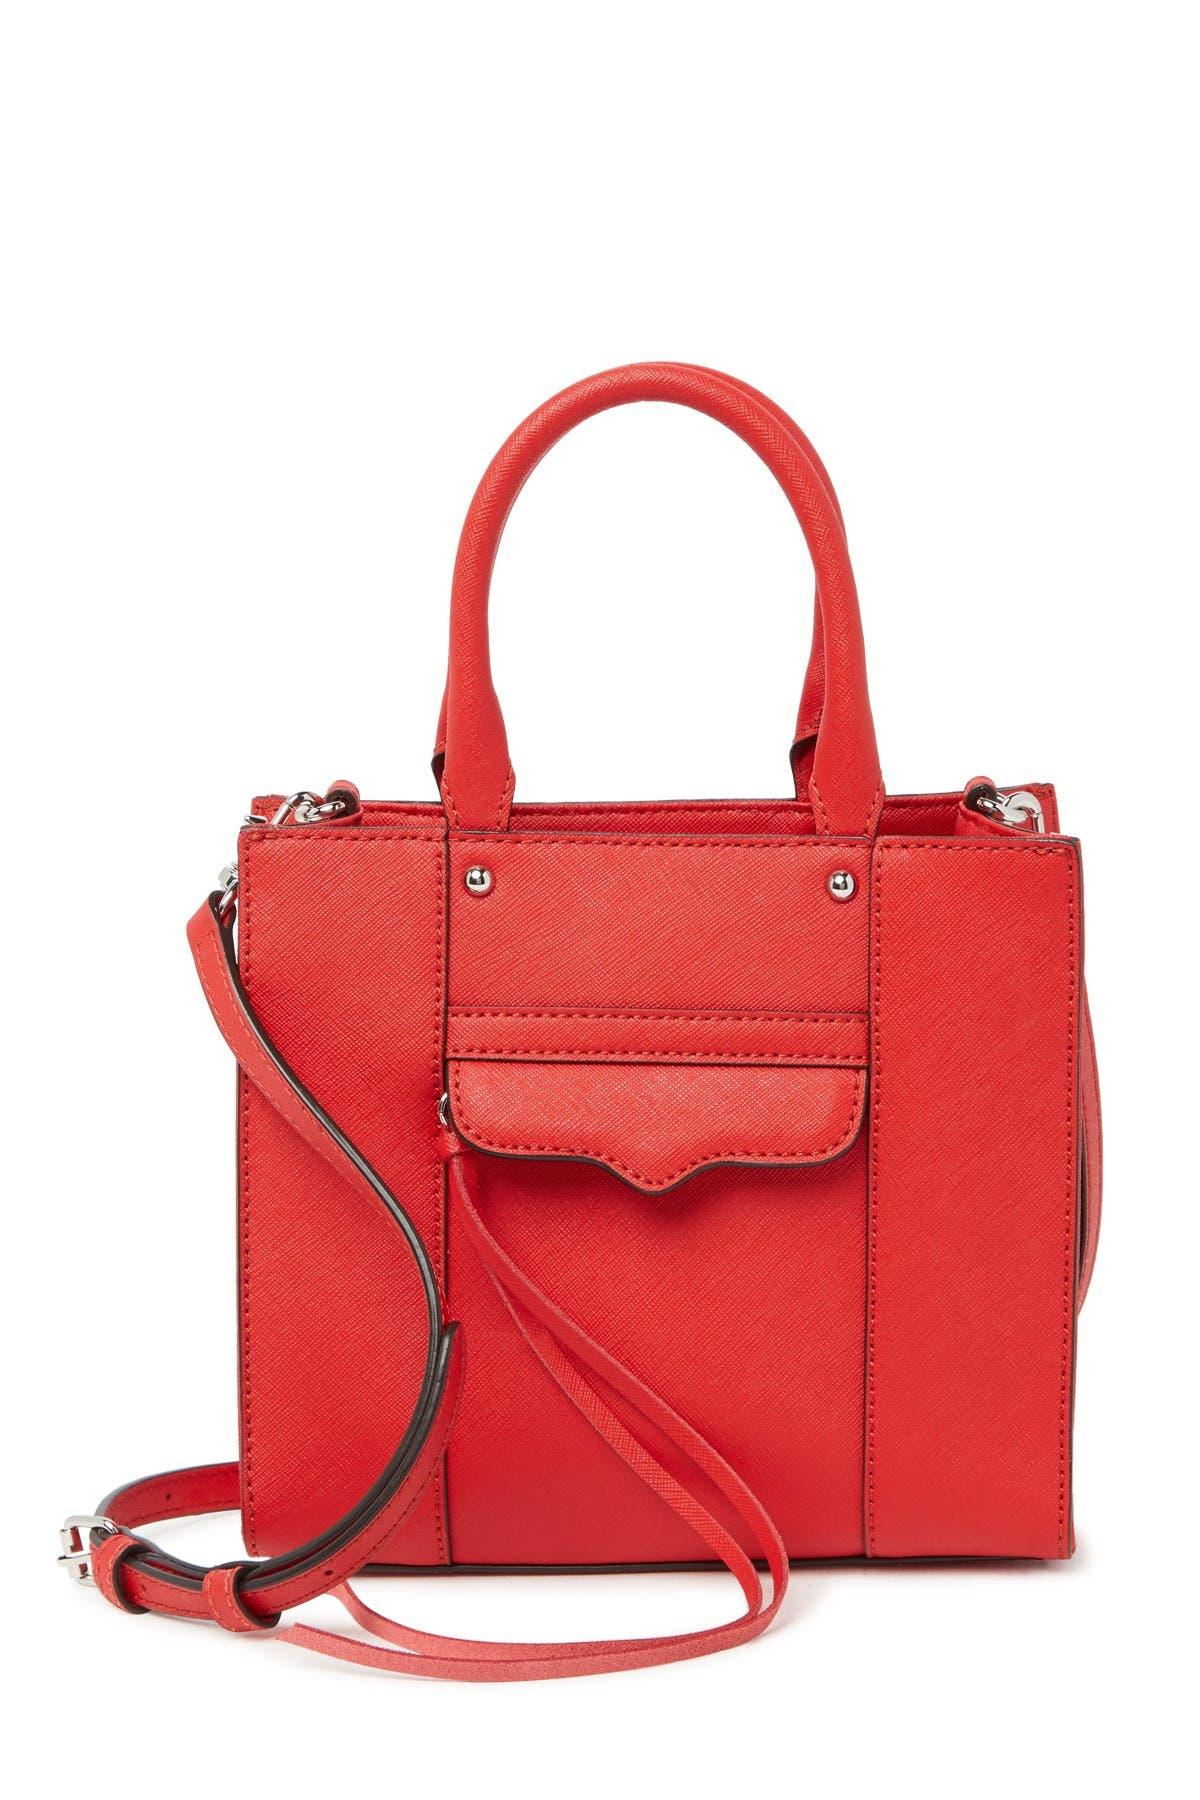 Image of Rebecca Minkoff MAB Mini Leather Tote Bag